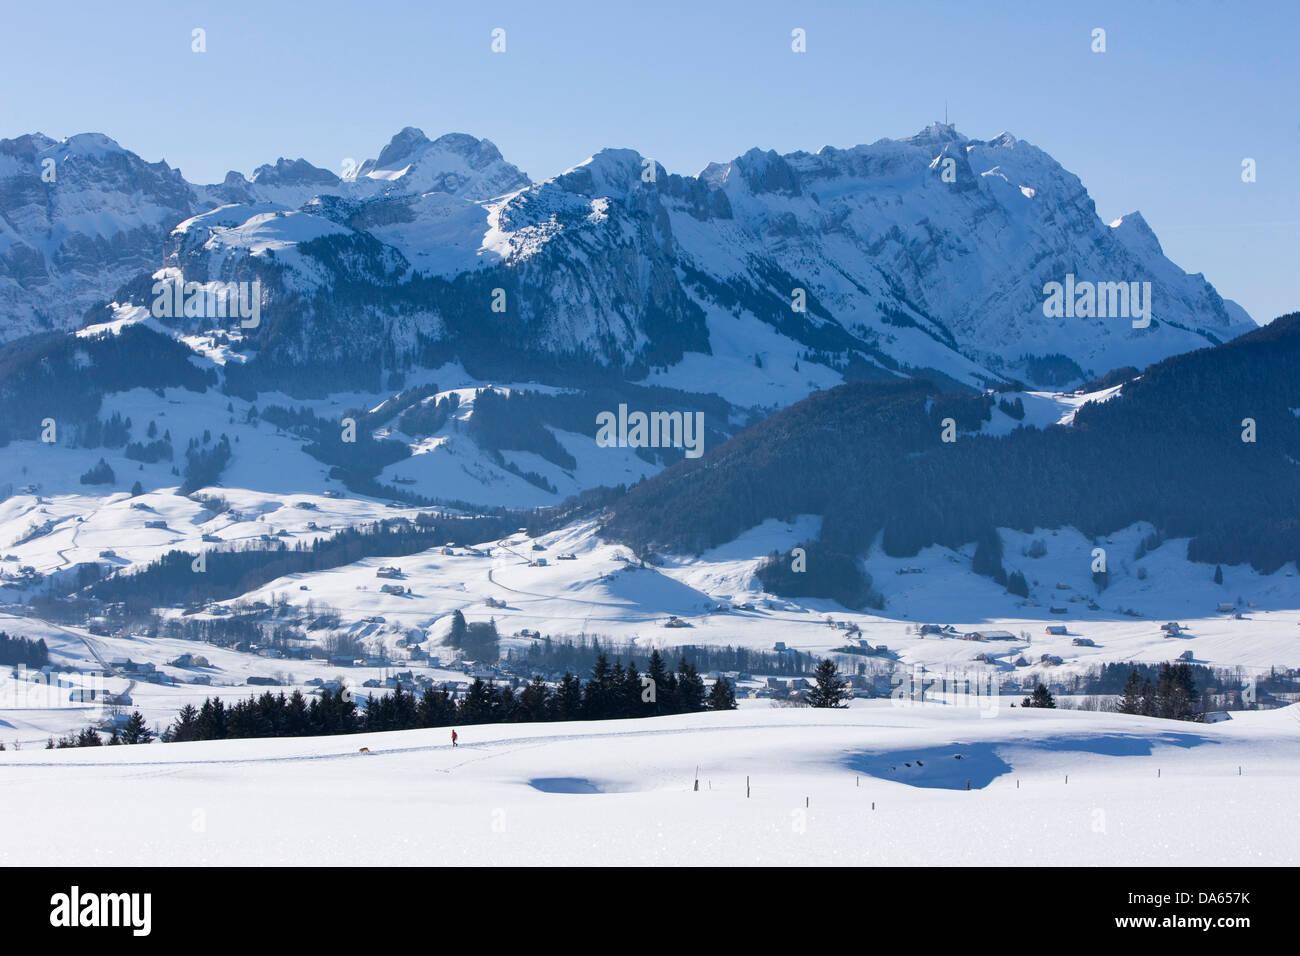 Säntis, Berg, Berge, Kanton Appenzell, Innerroden, Appenzell Bereich, Alpstein, Winter, Schweiz, Europa, Landschaft, Stockbild